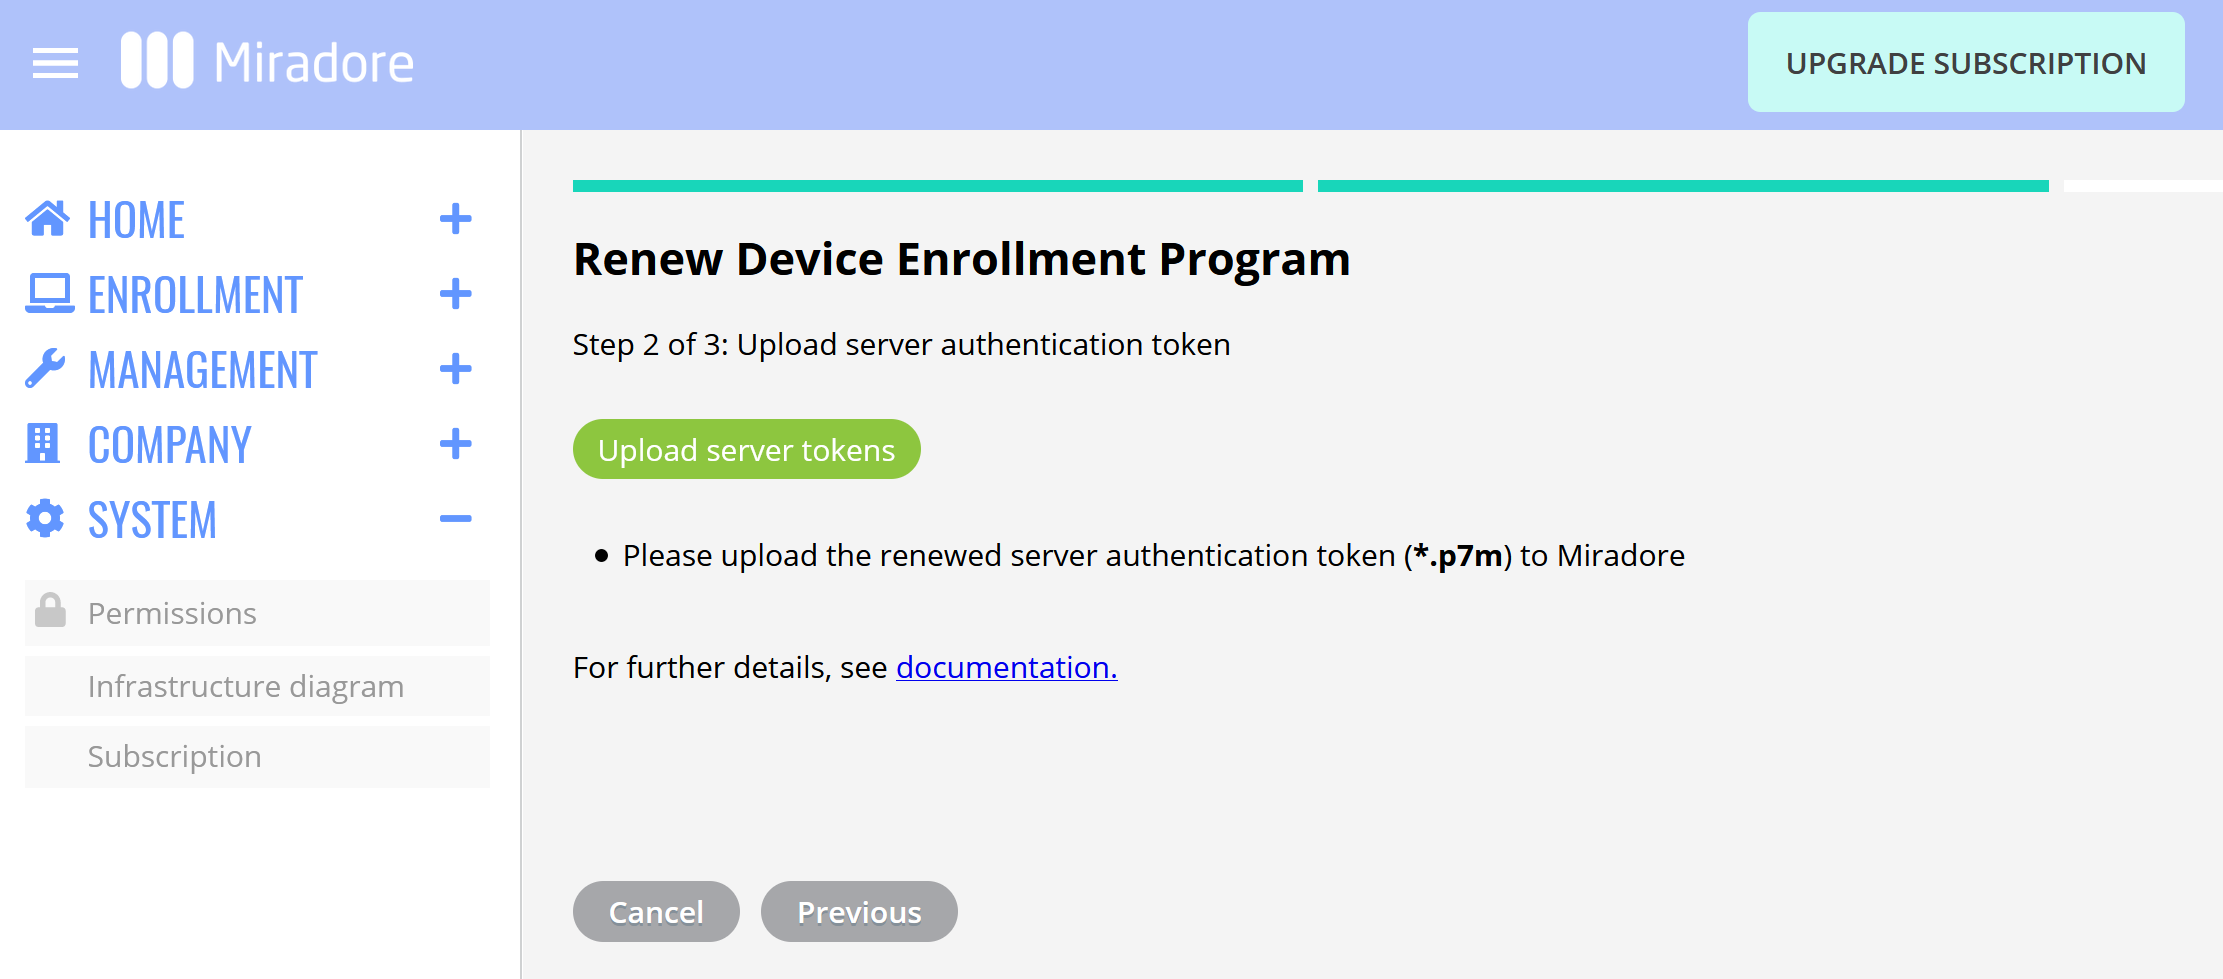 Uploading Apple DEP server token to Miradore